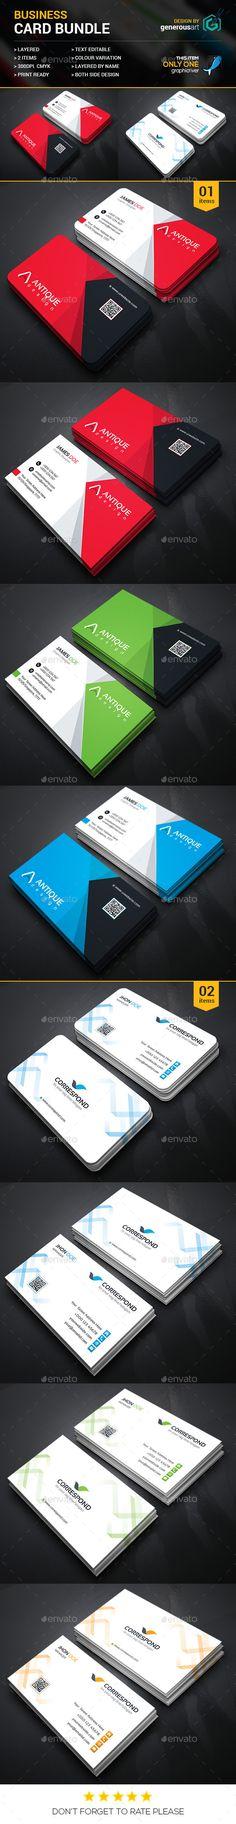 Business Card Bundle 2 in 1_2 - Corporate Business Cards Downlaod here : http://graphicriver.net/item/business-card-bundle-2-in-1_2/12247132?s_rank=1704&ref=Al-fatih